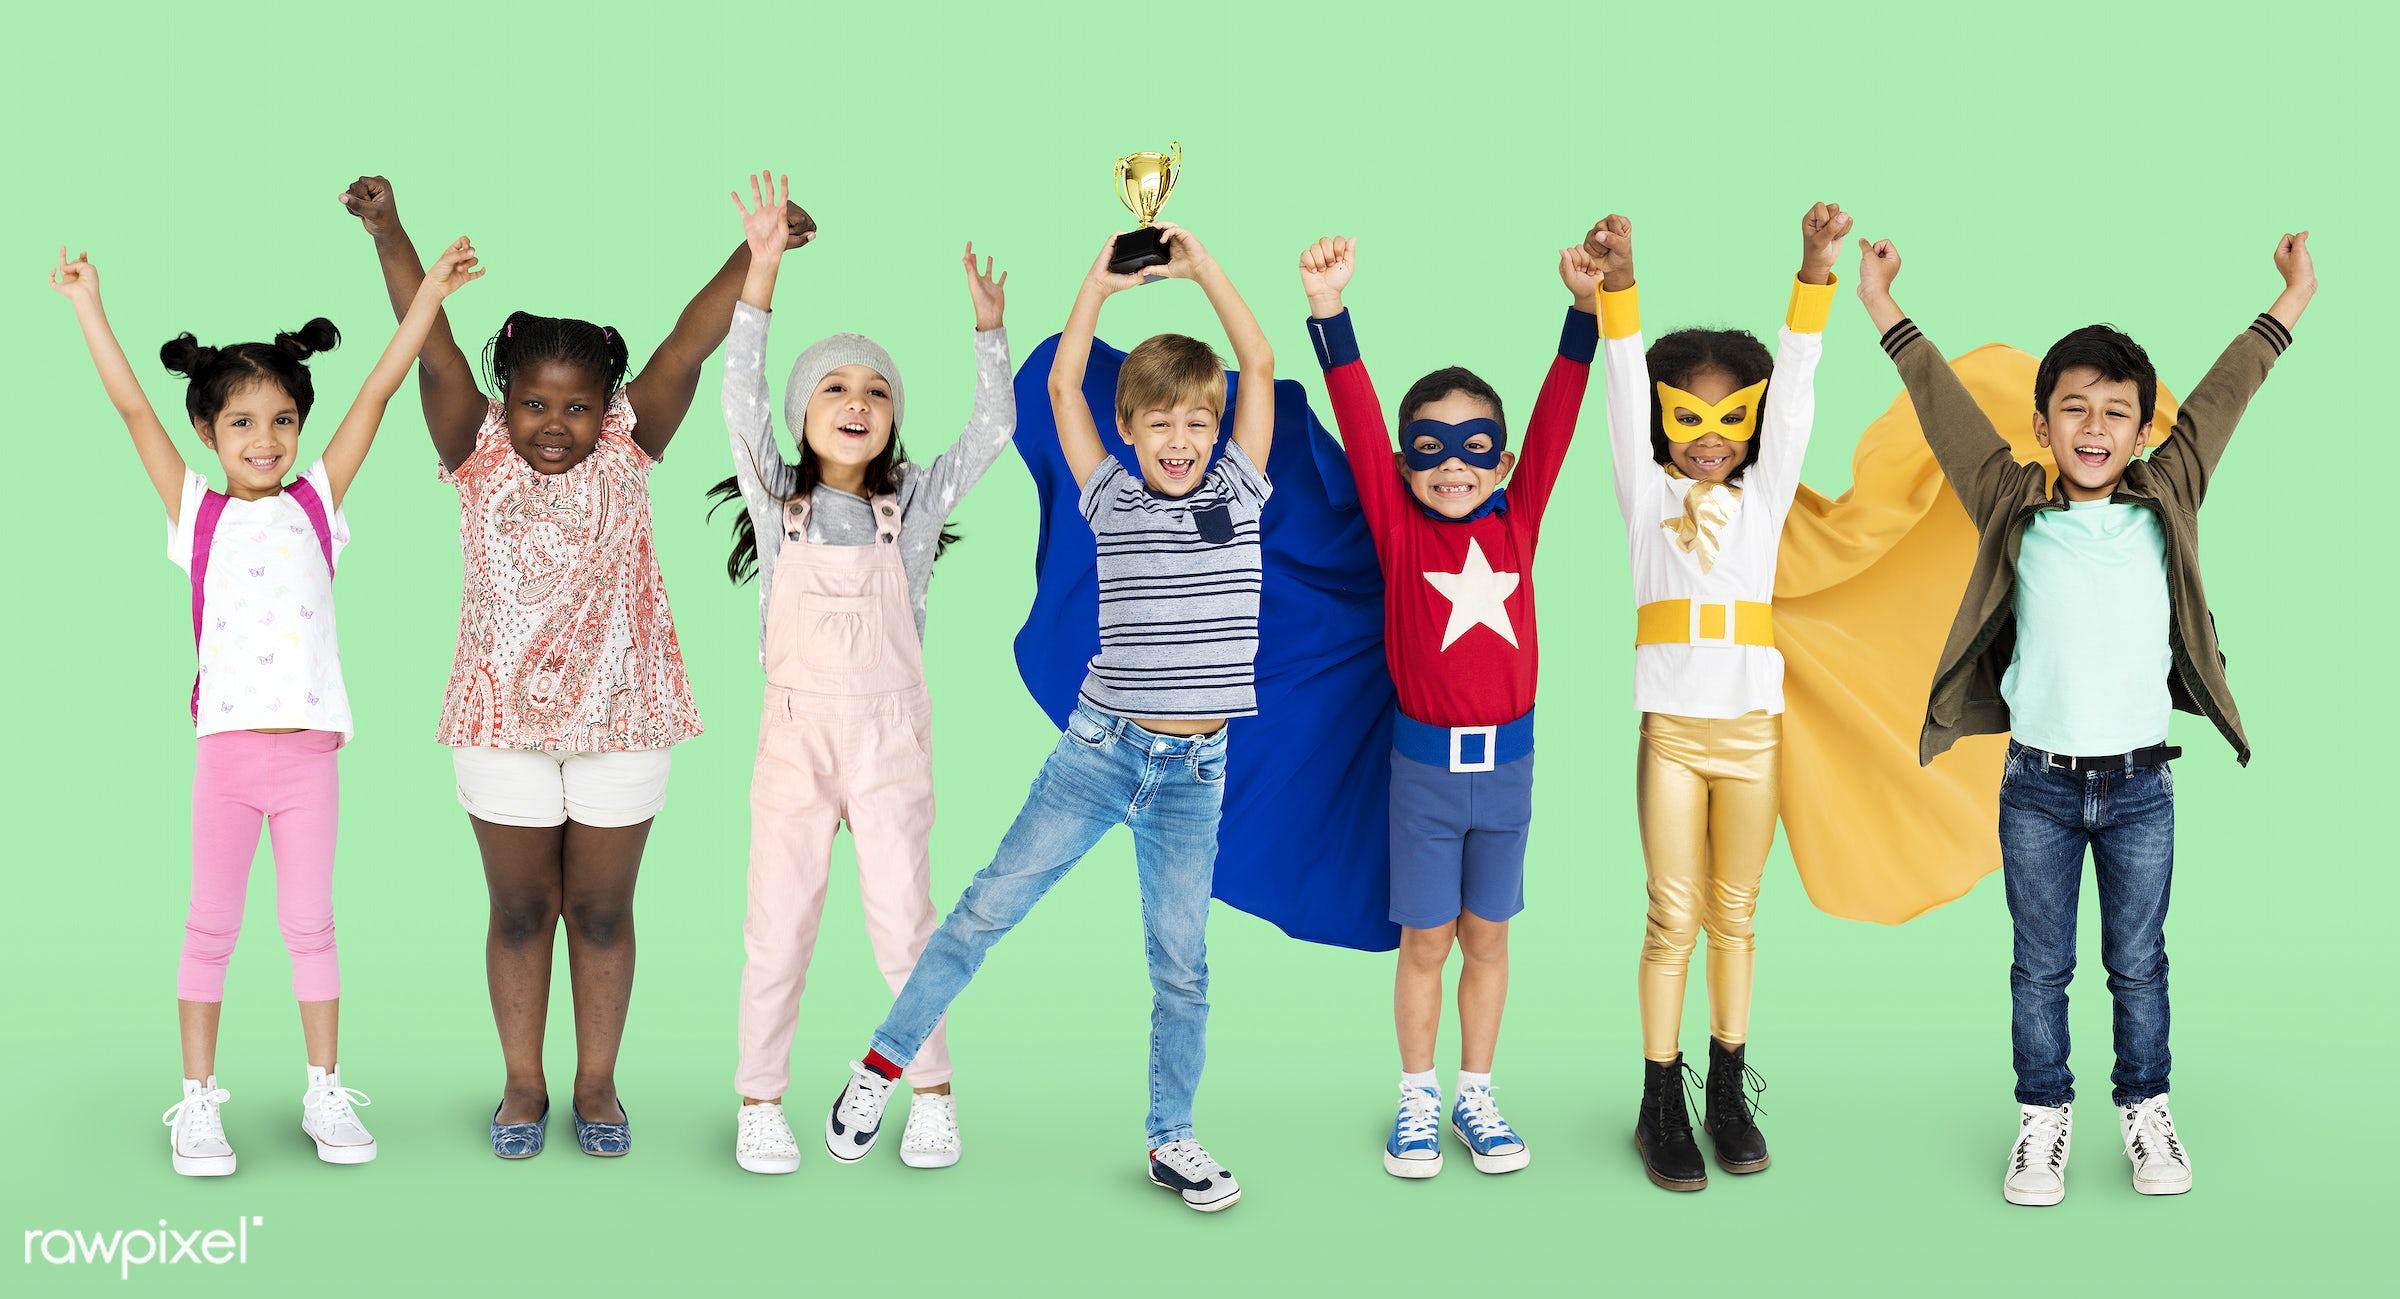 studio, person, little, winner, people, together, kid, teamwork, friends, friendship, childhood, studio squareset, cheerful...